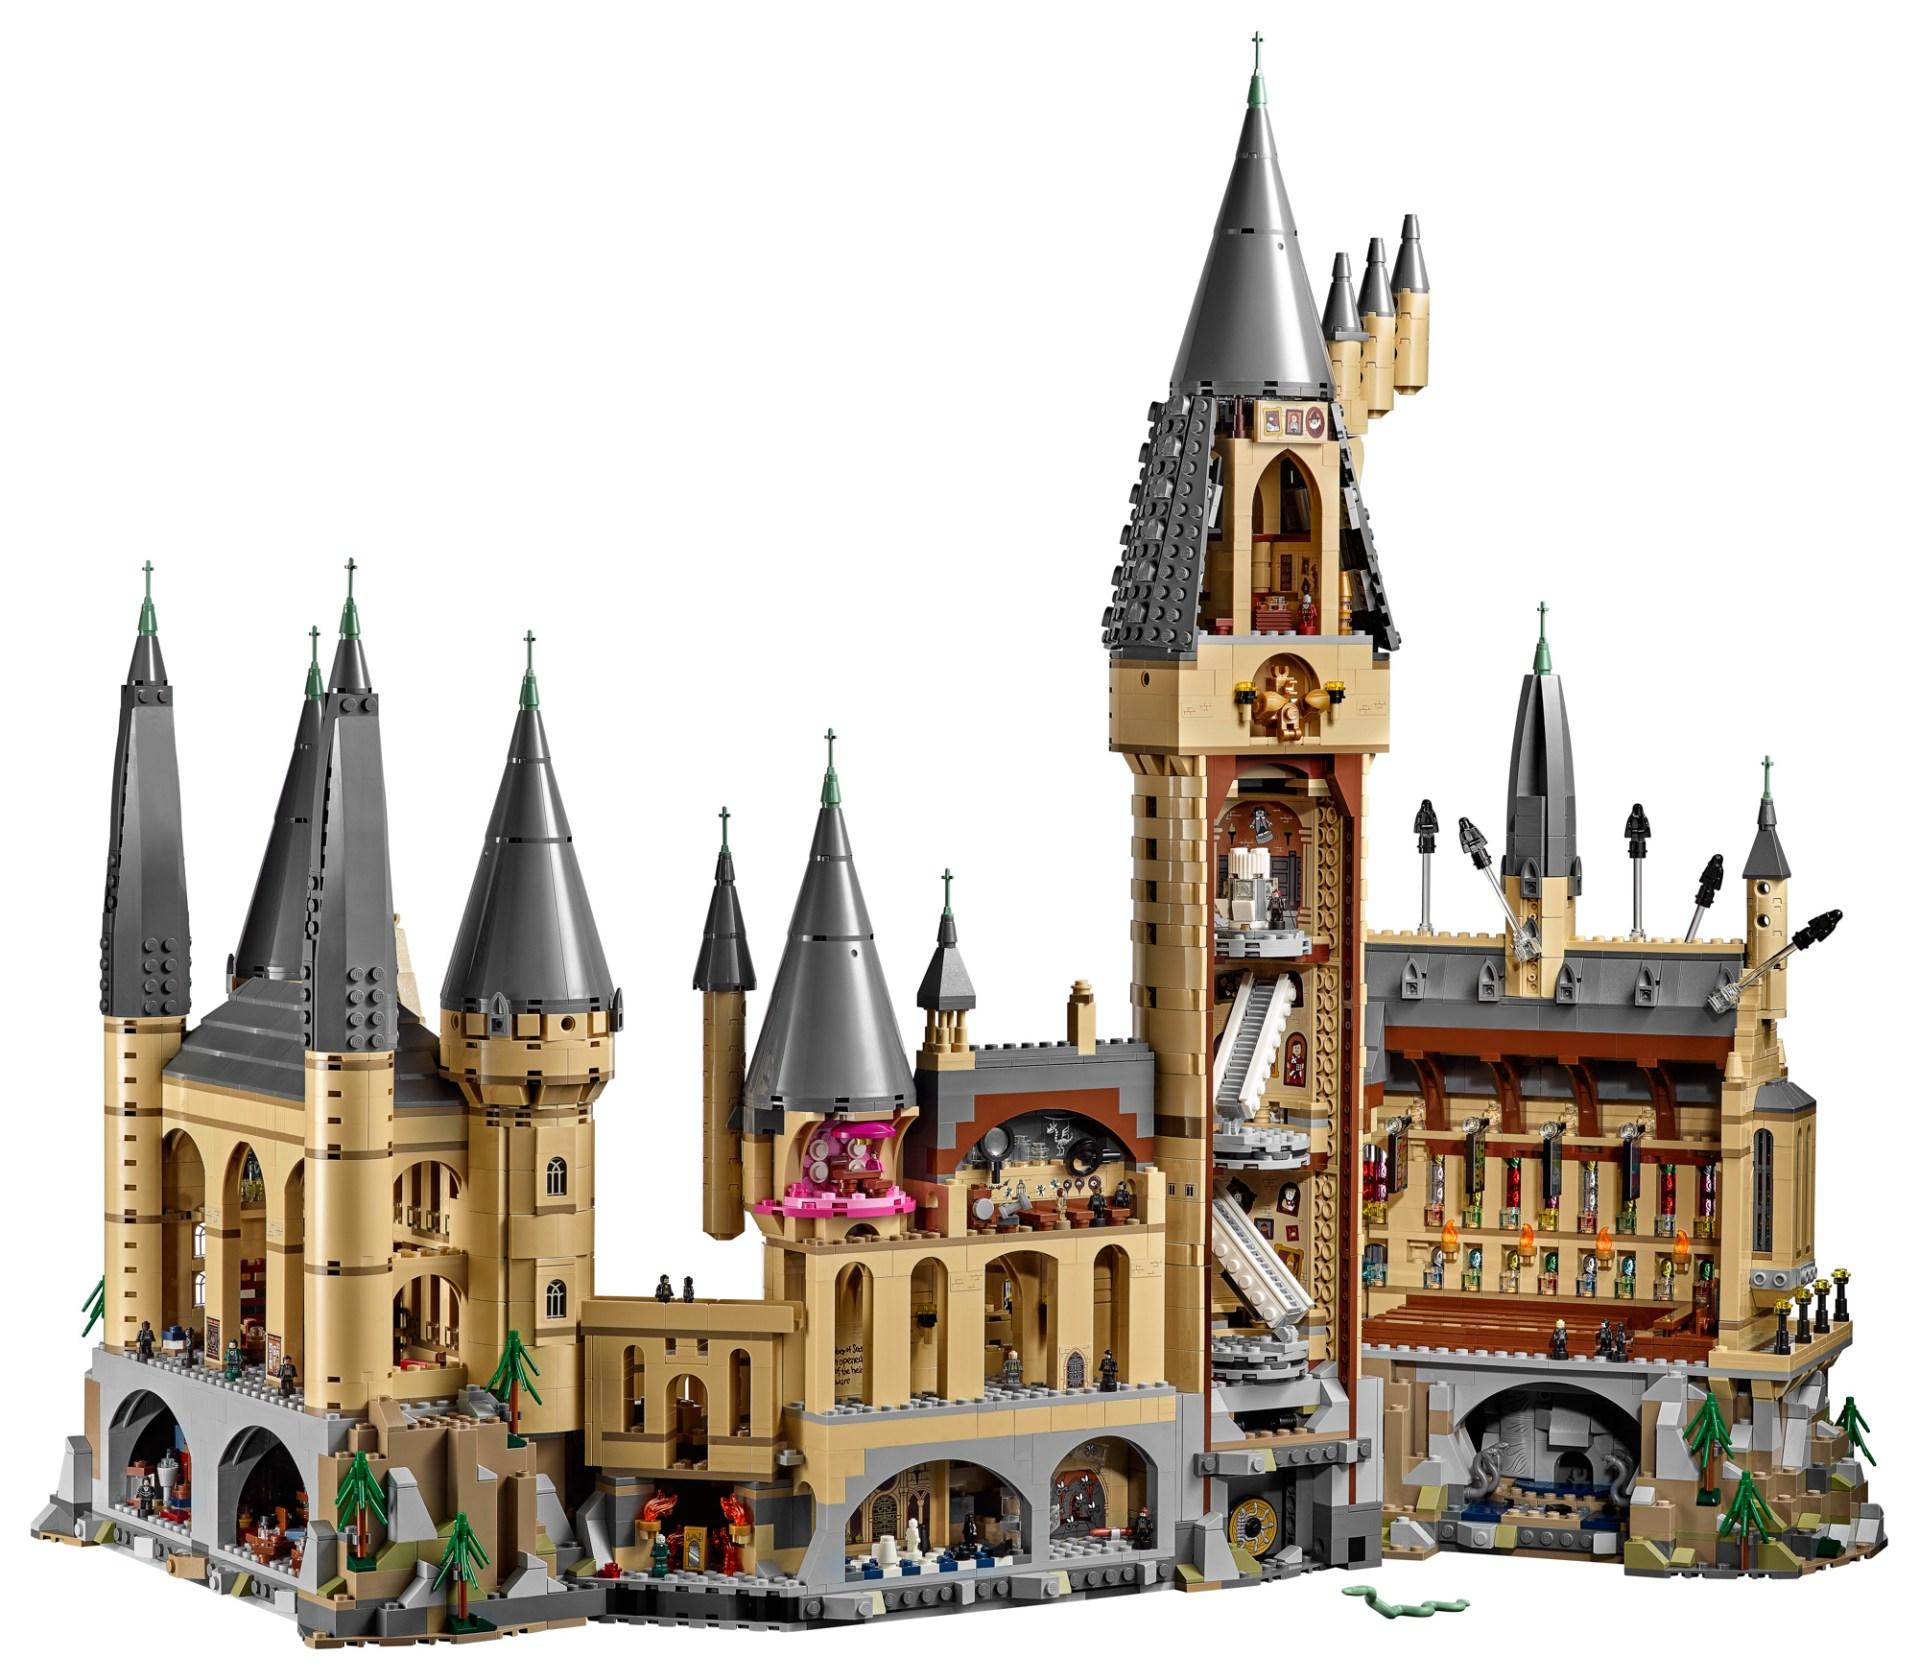 71043-Harry-Potter-Hogwarts-Castle-6.jpg